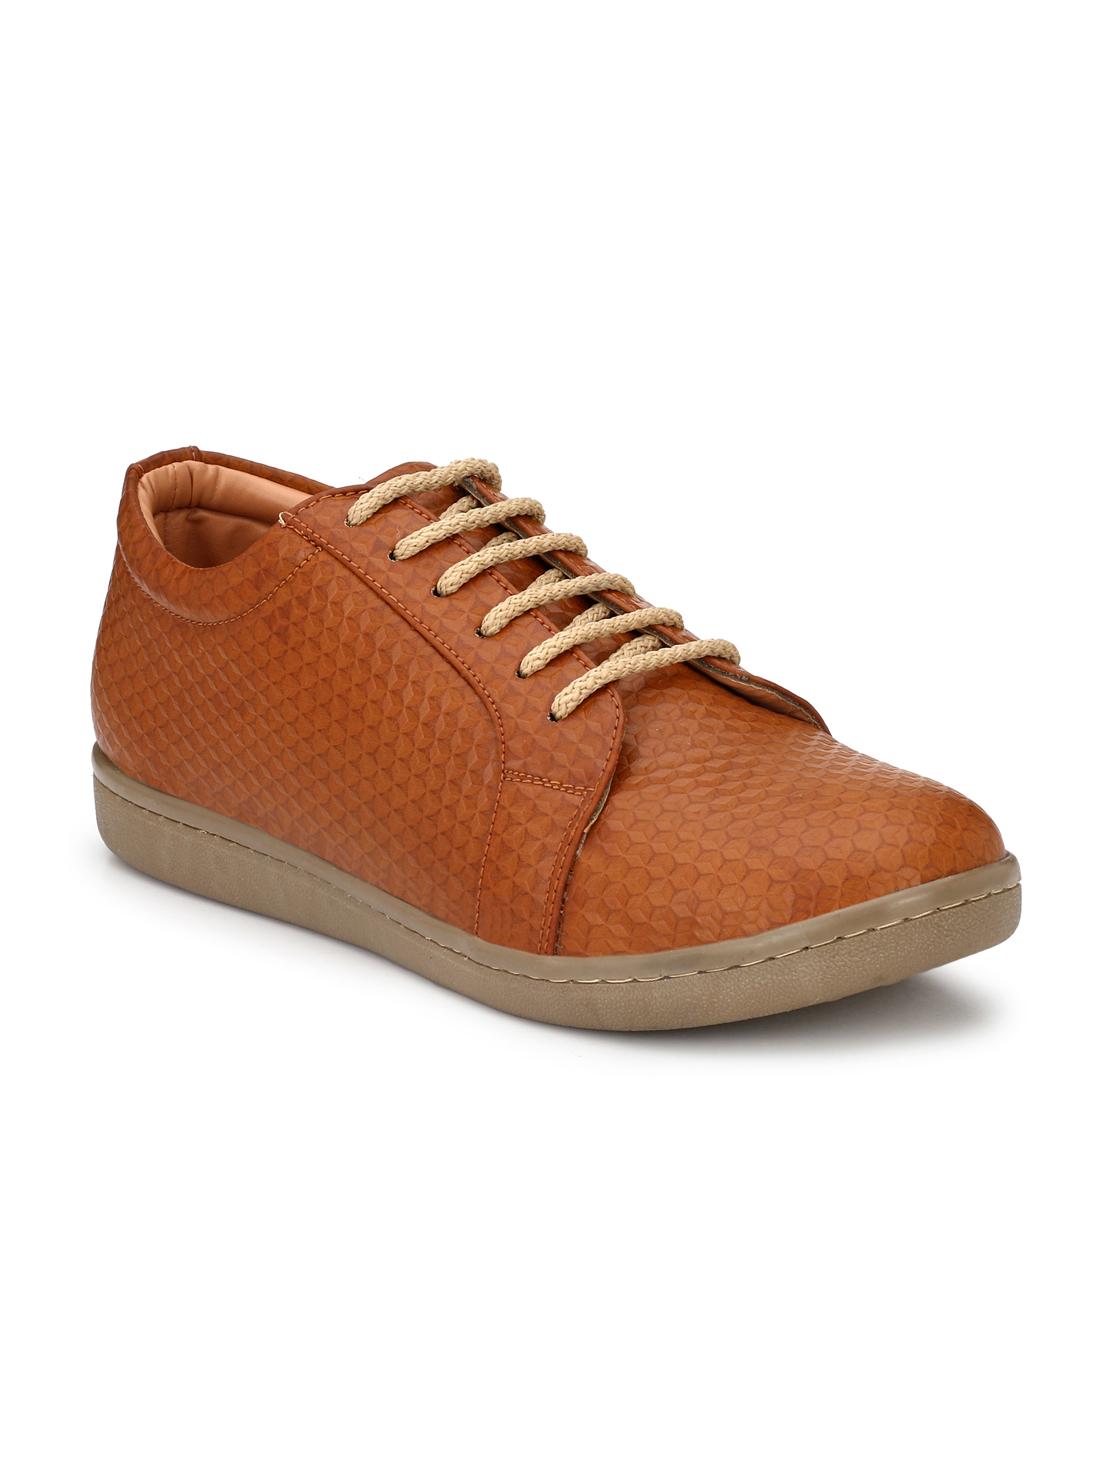 Guava | Guava Men's diamond cut comfy sneakers - Brown